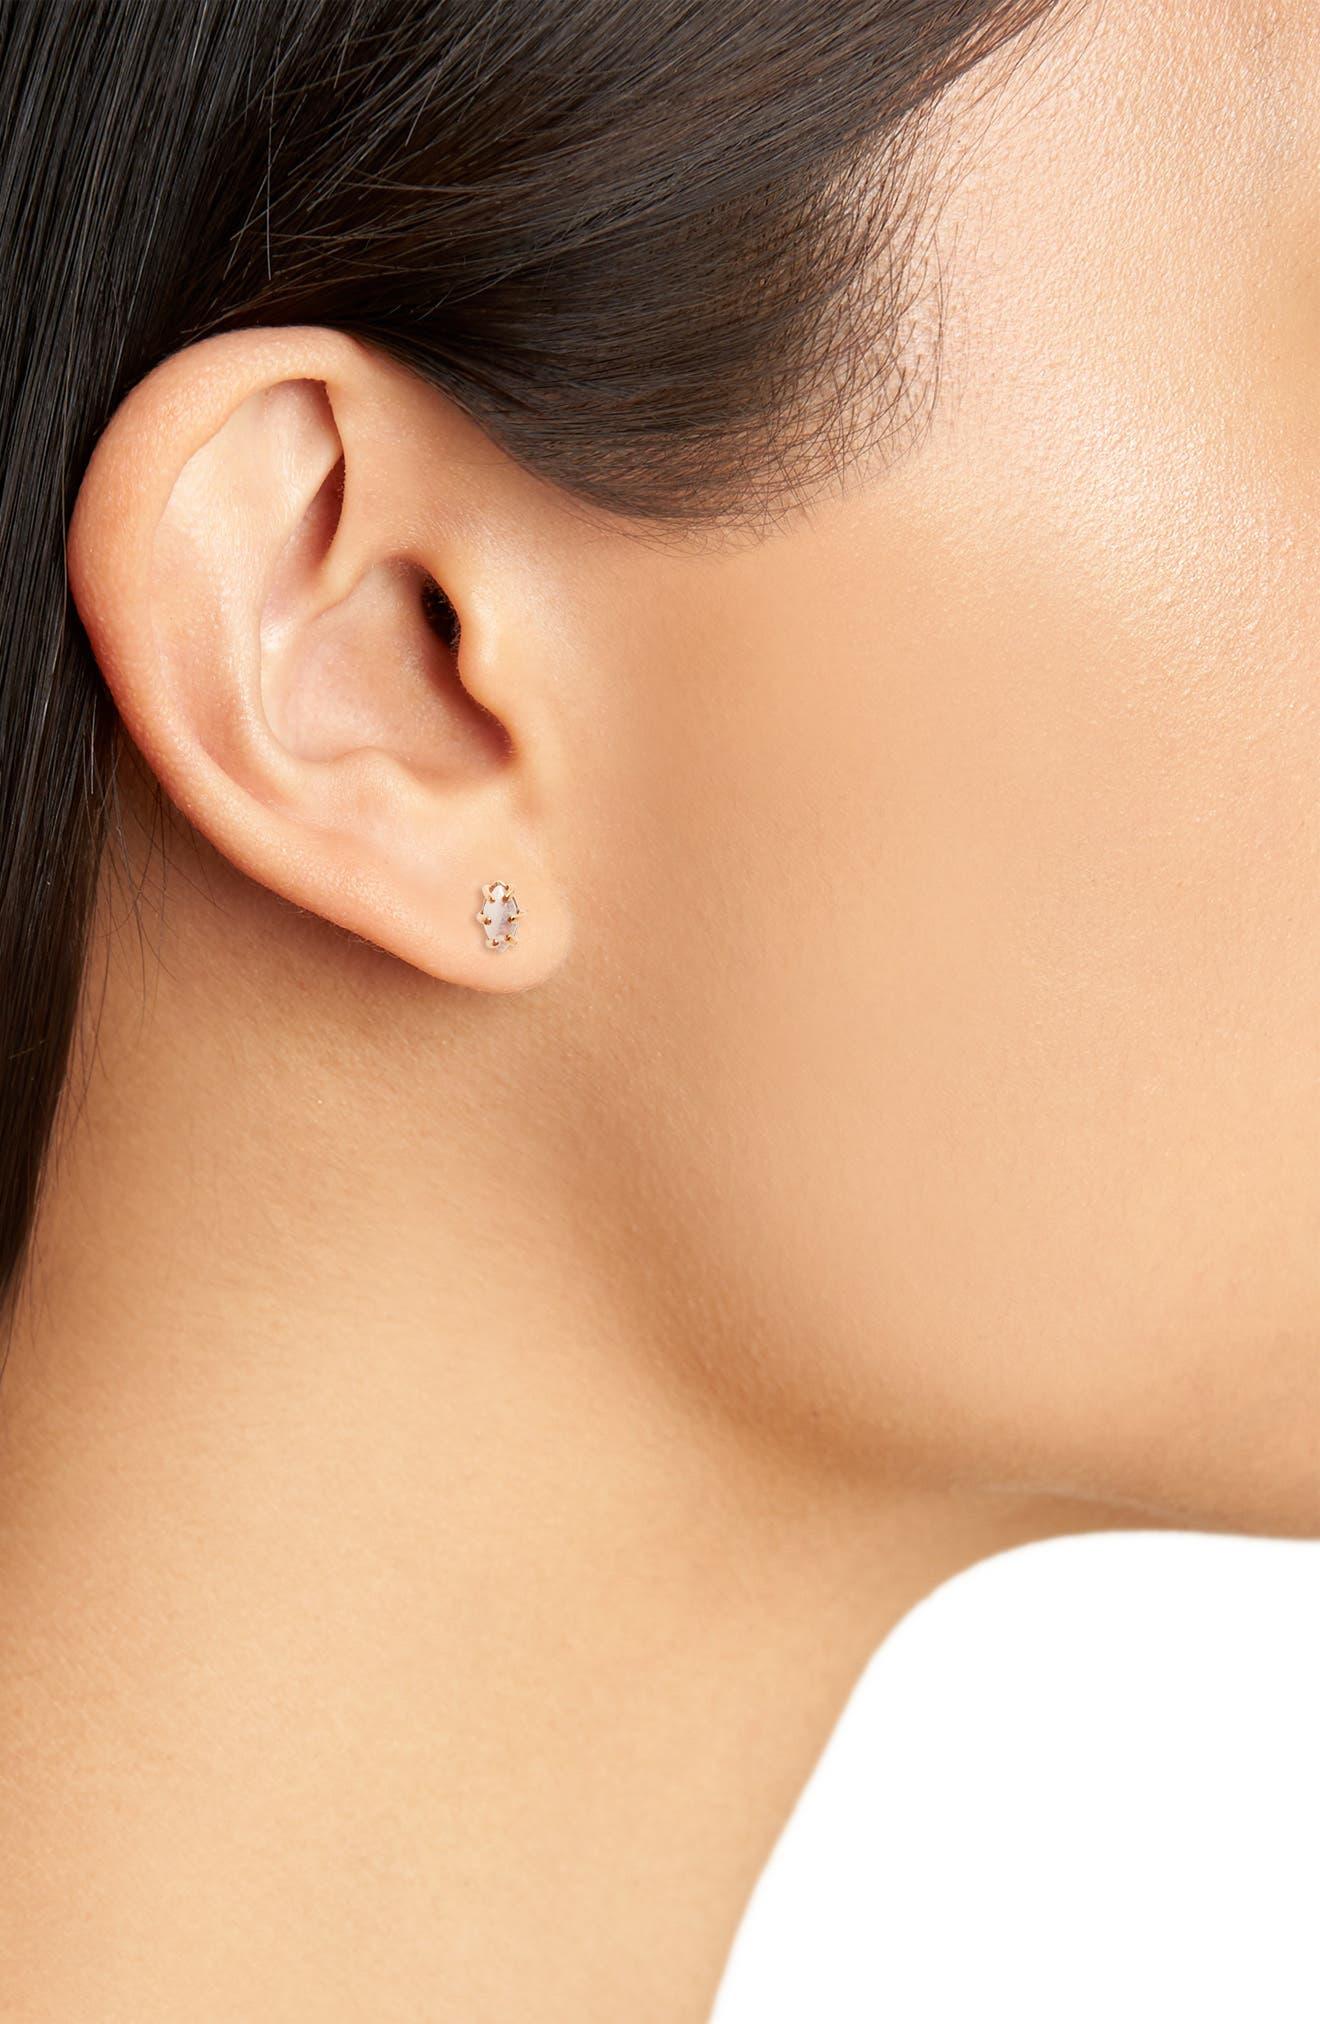 Moonstone Stud Earrings,                             Alternate thumbnail 2, color,